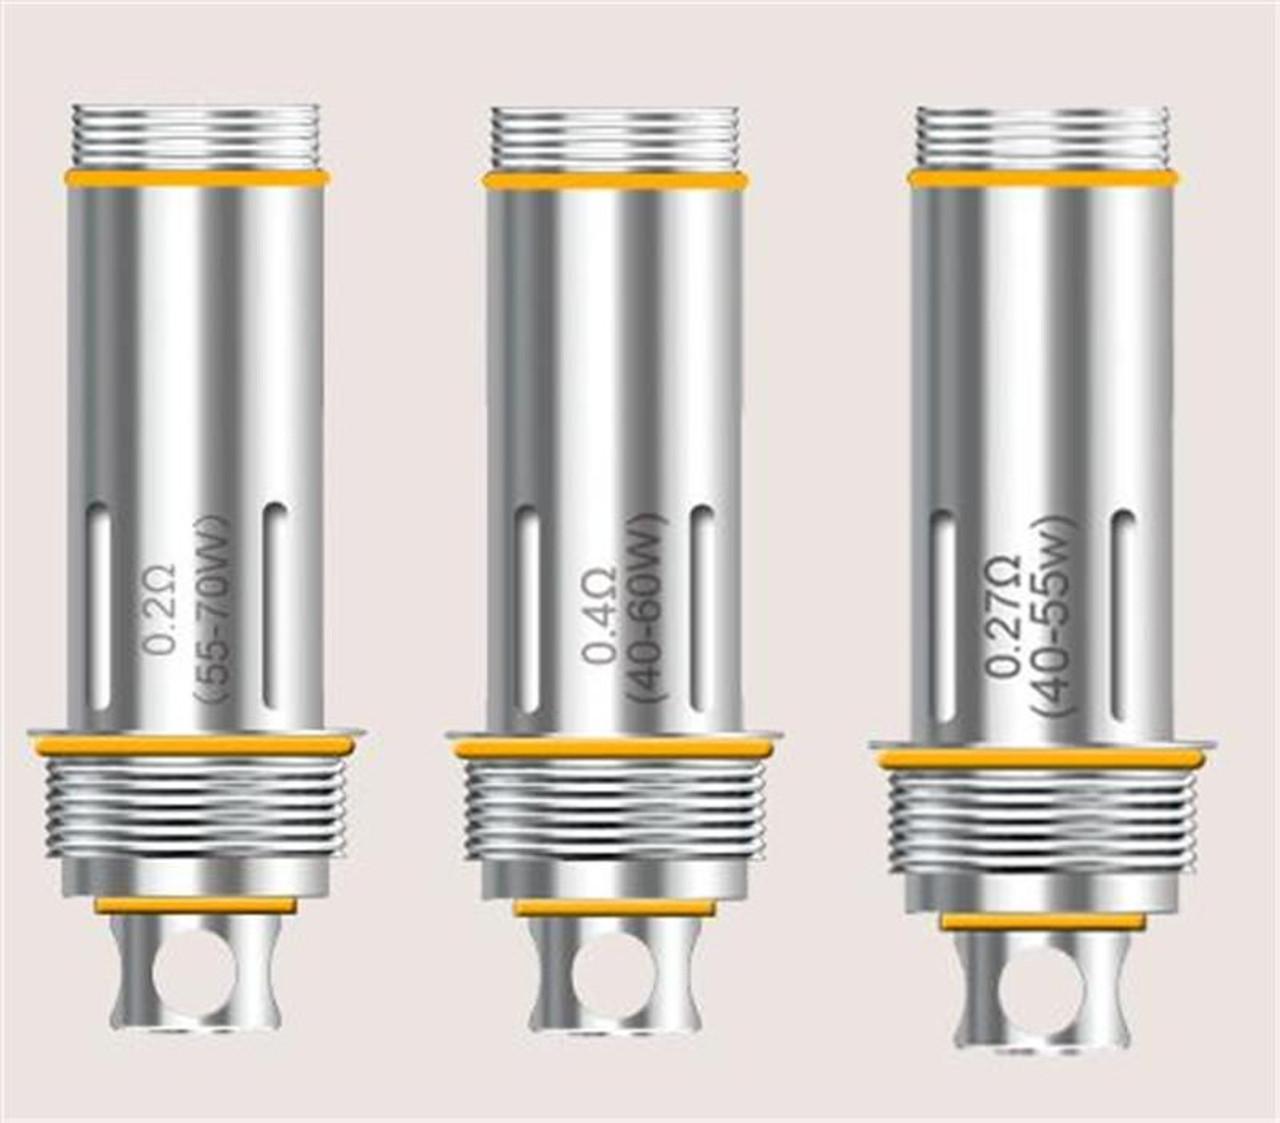 Cleito Sub Ohm 0.2ohm, 0.27ohm, 0.4ohm, SS316 T/C 0.4ohm Coils 1pc.